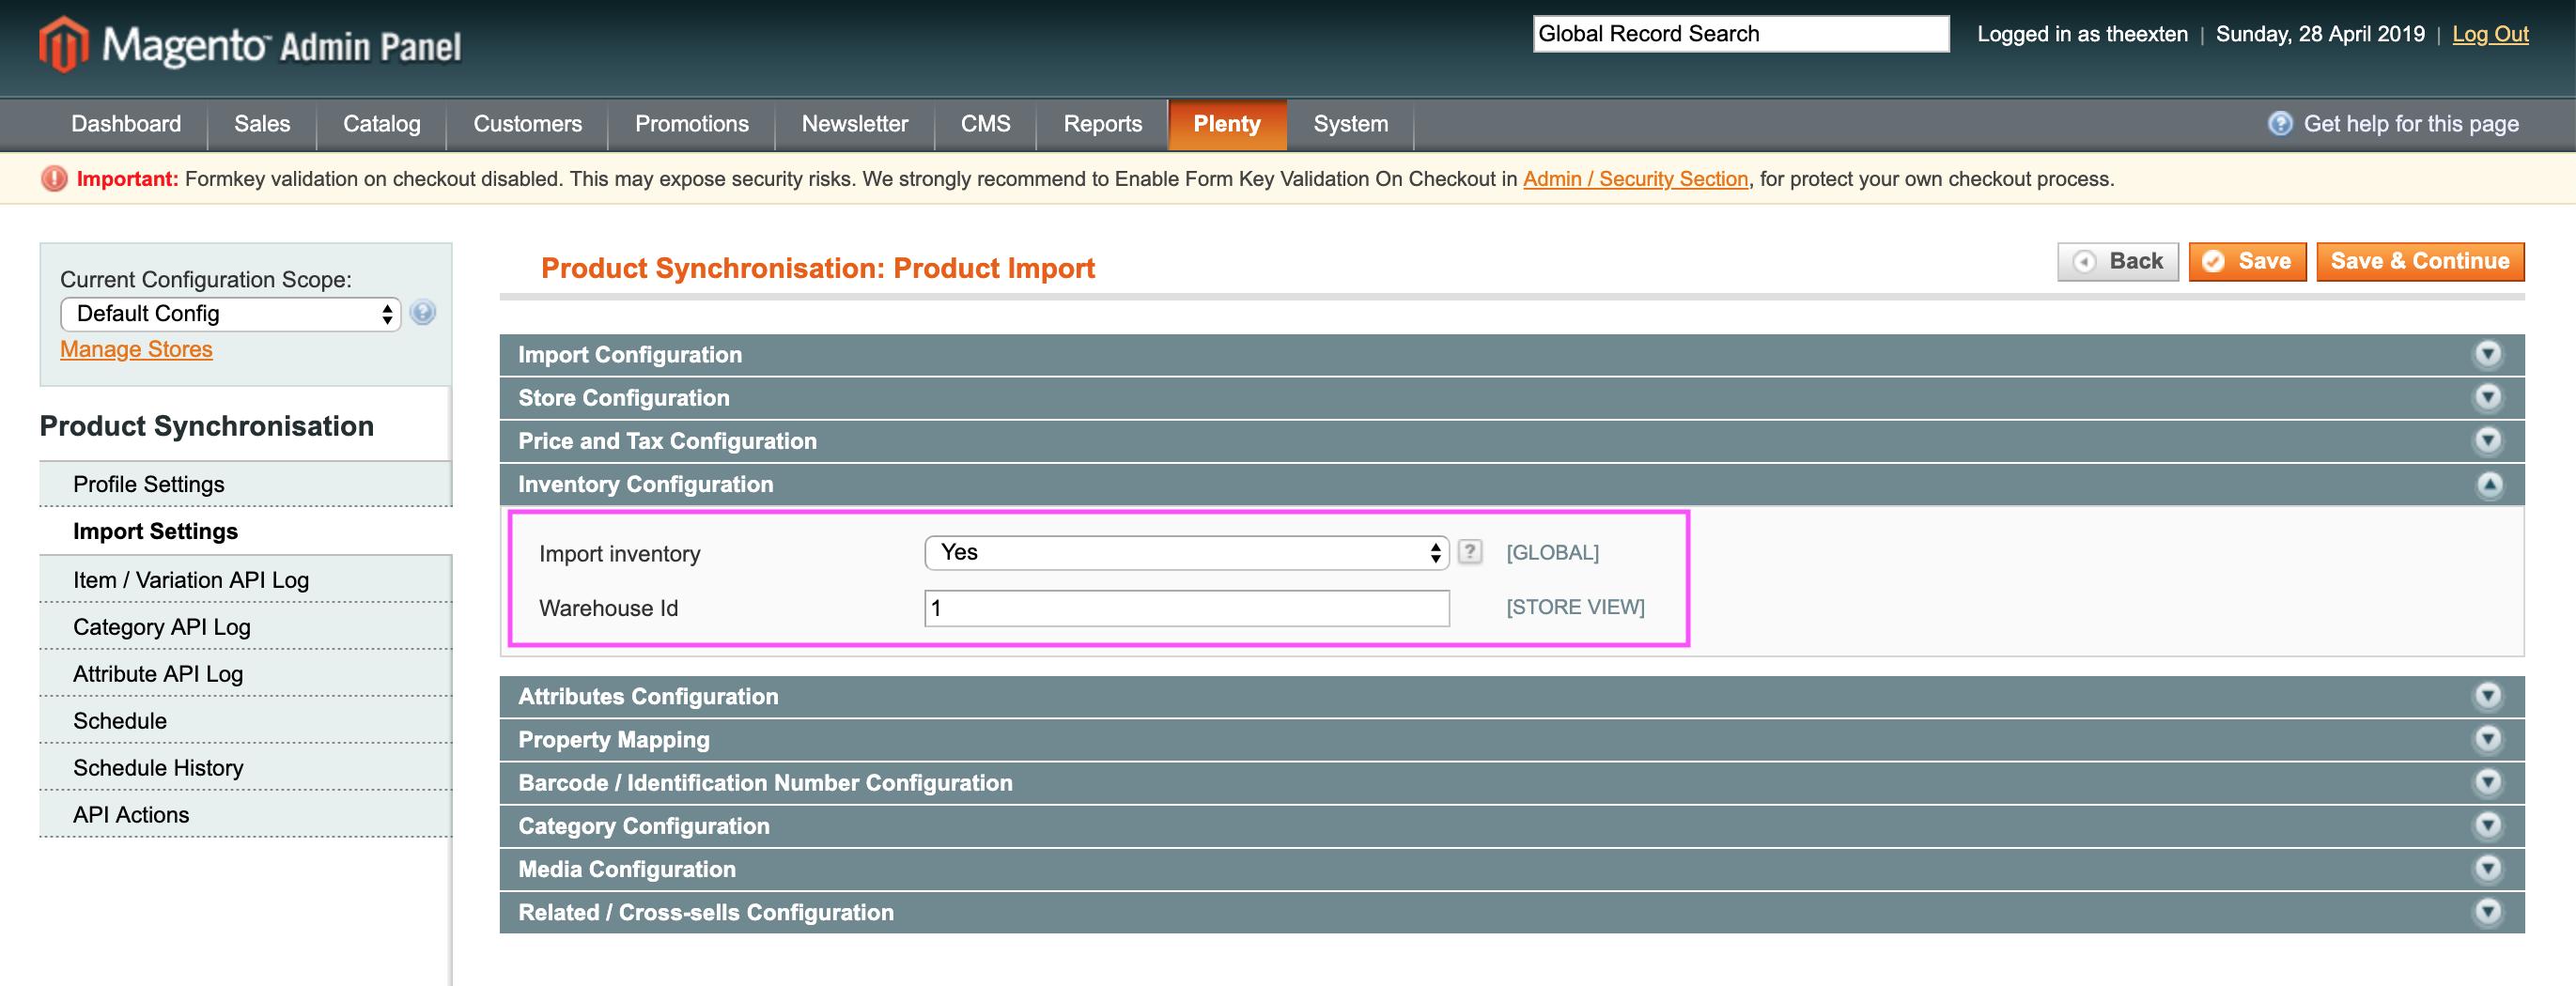 Mage2Plenty - product import - stock configuration